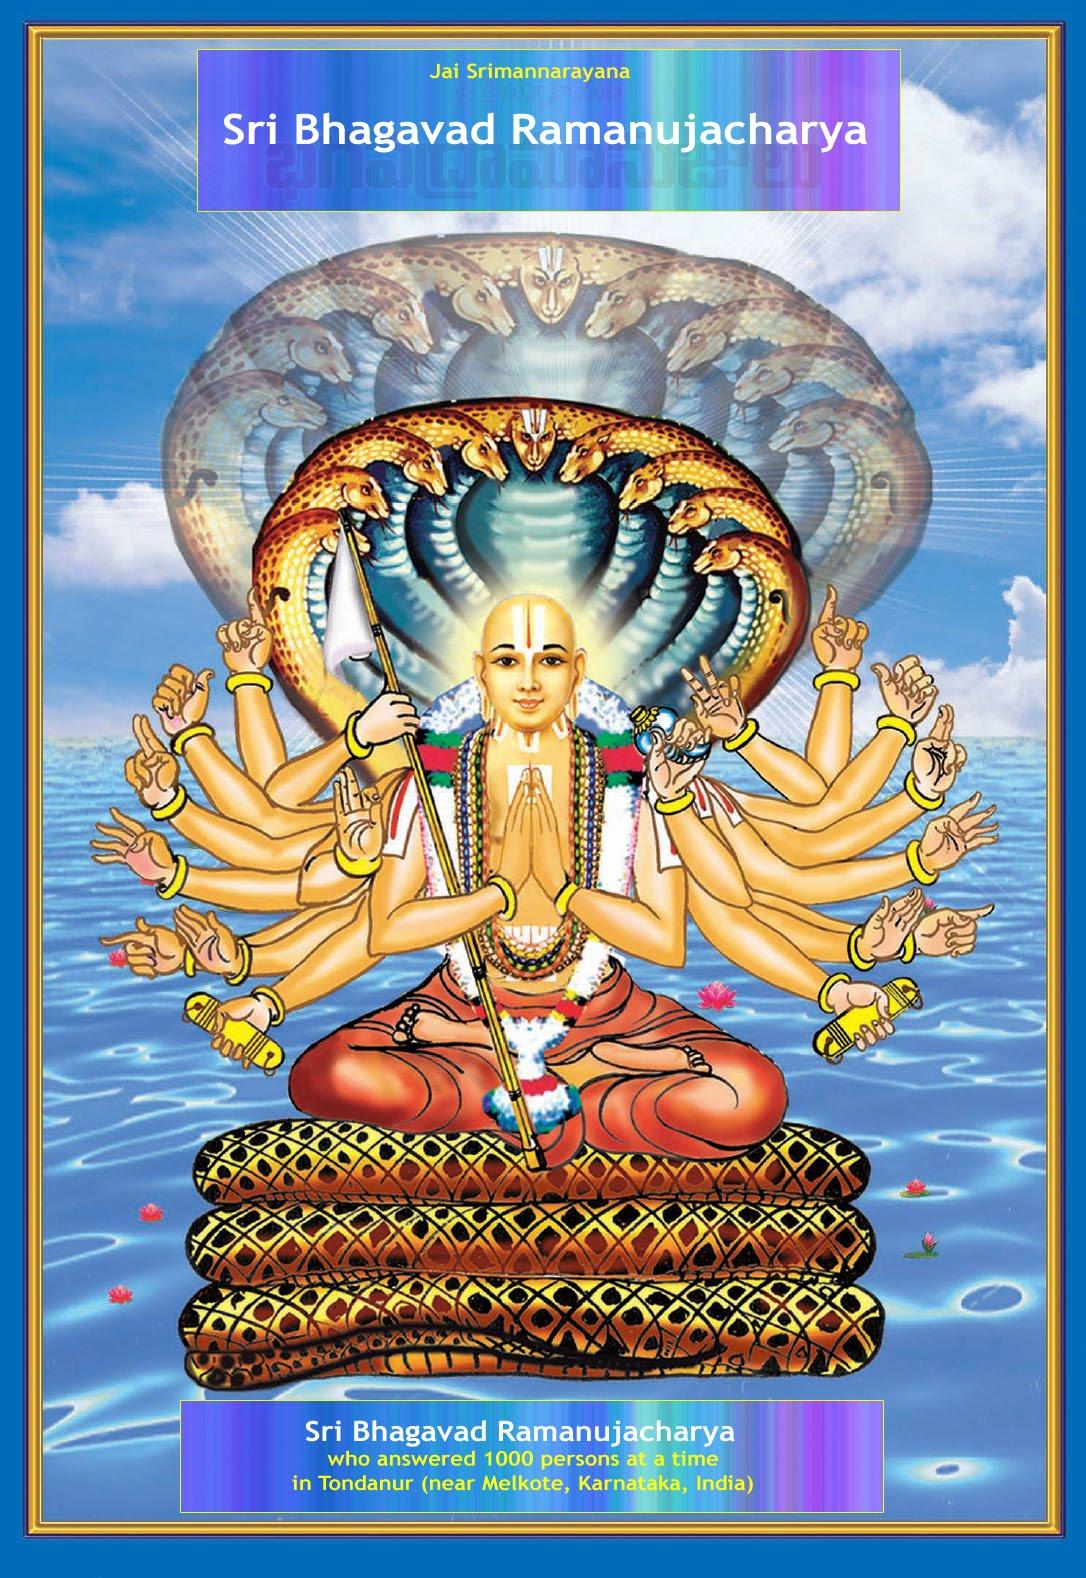 Sri Acharya